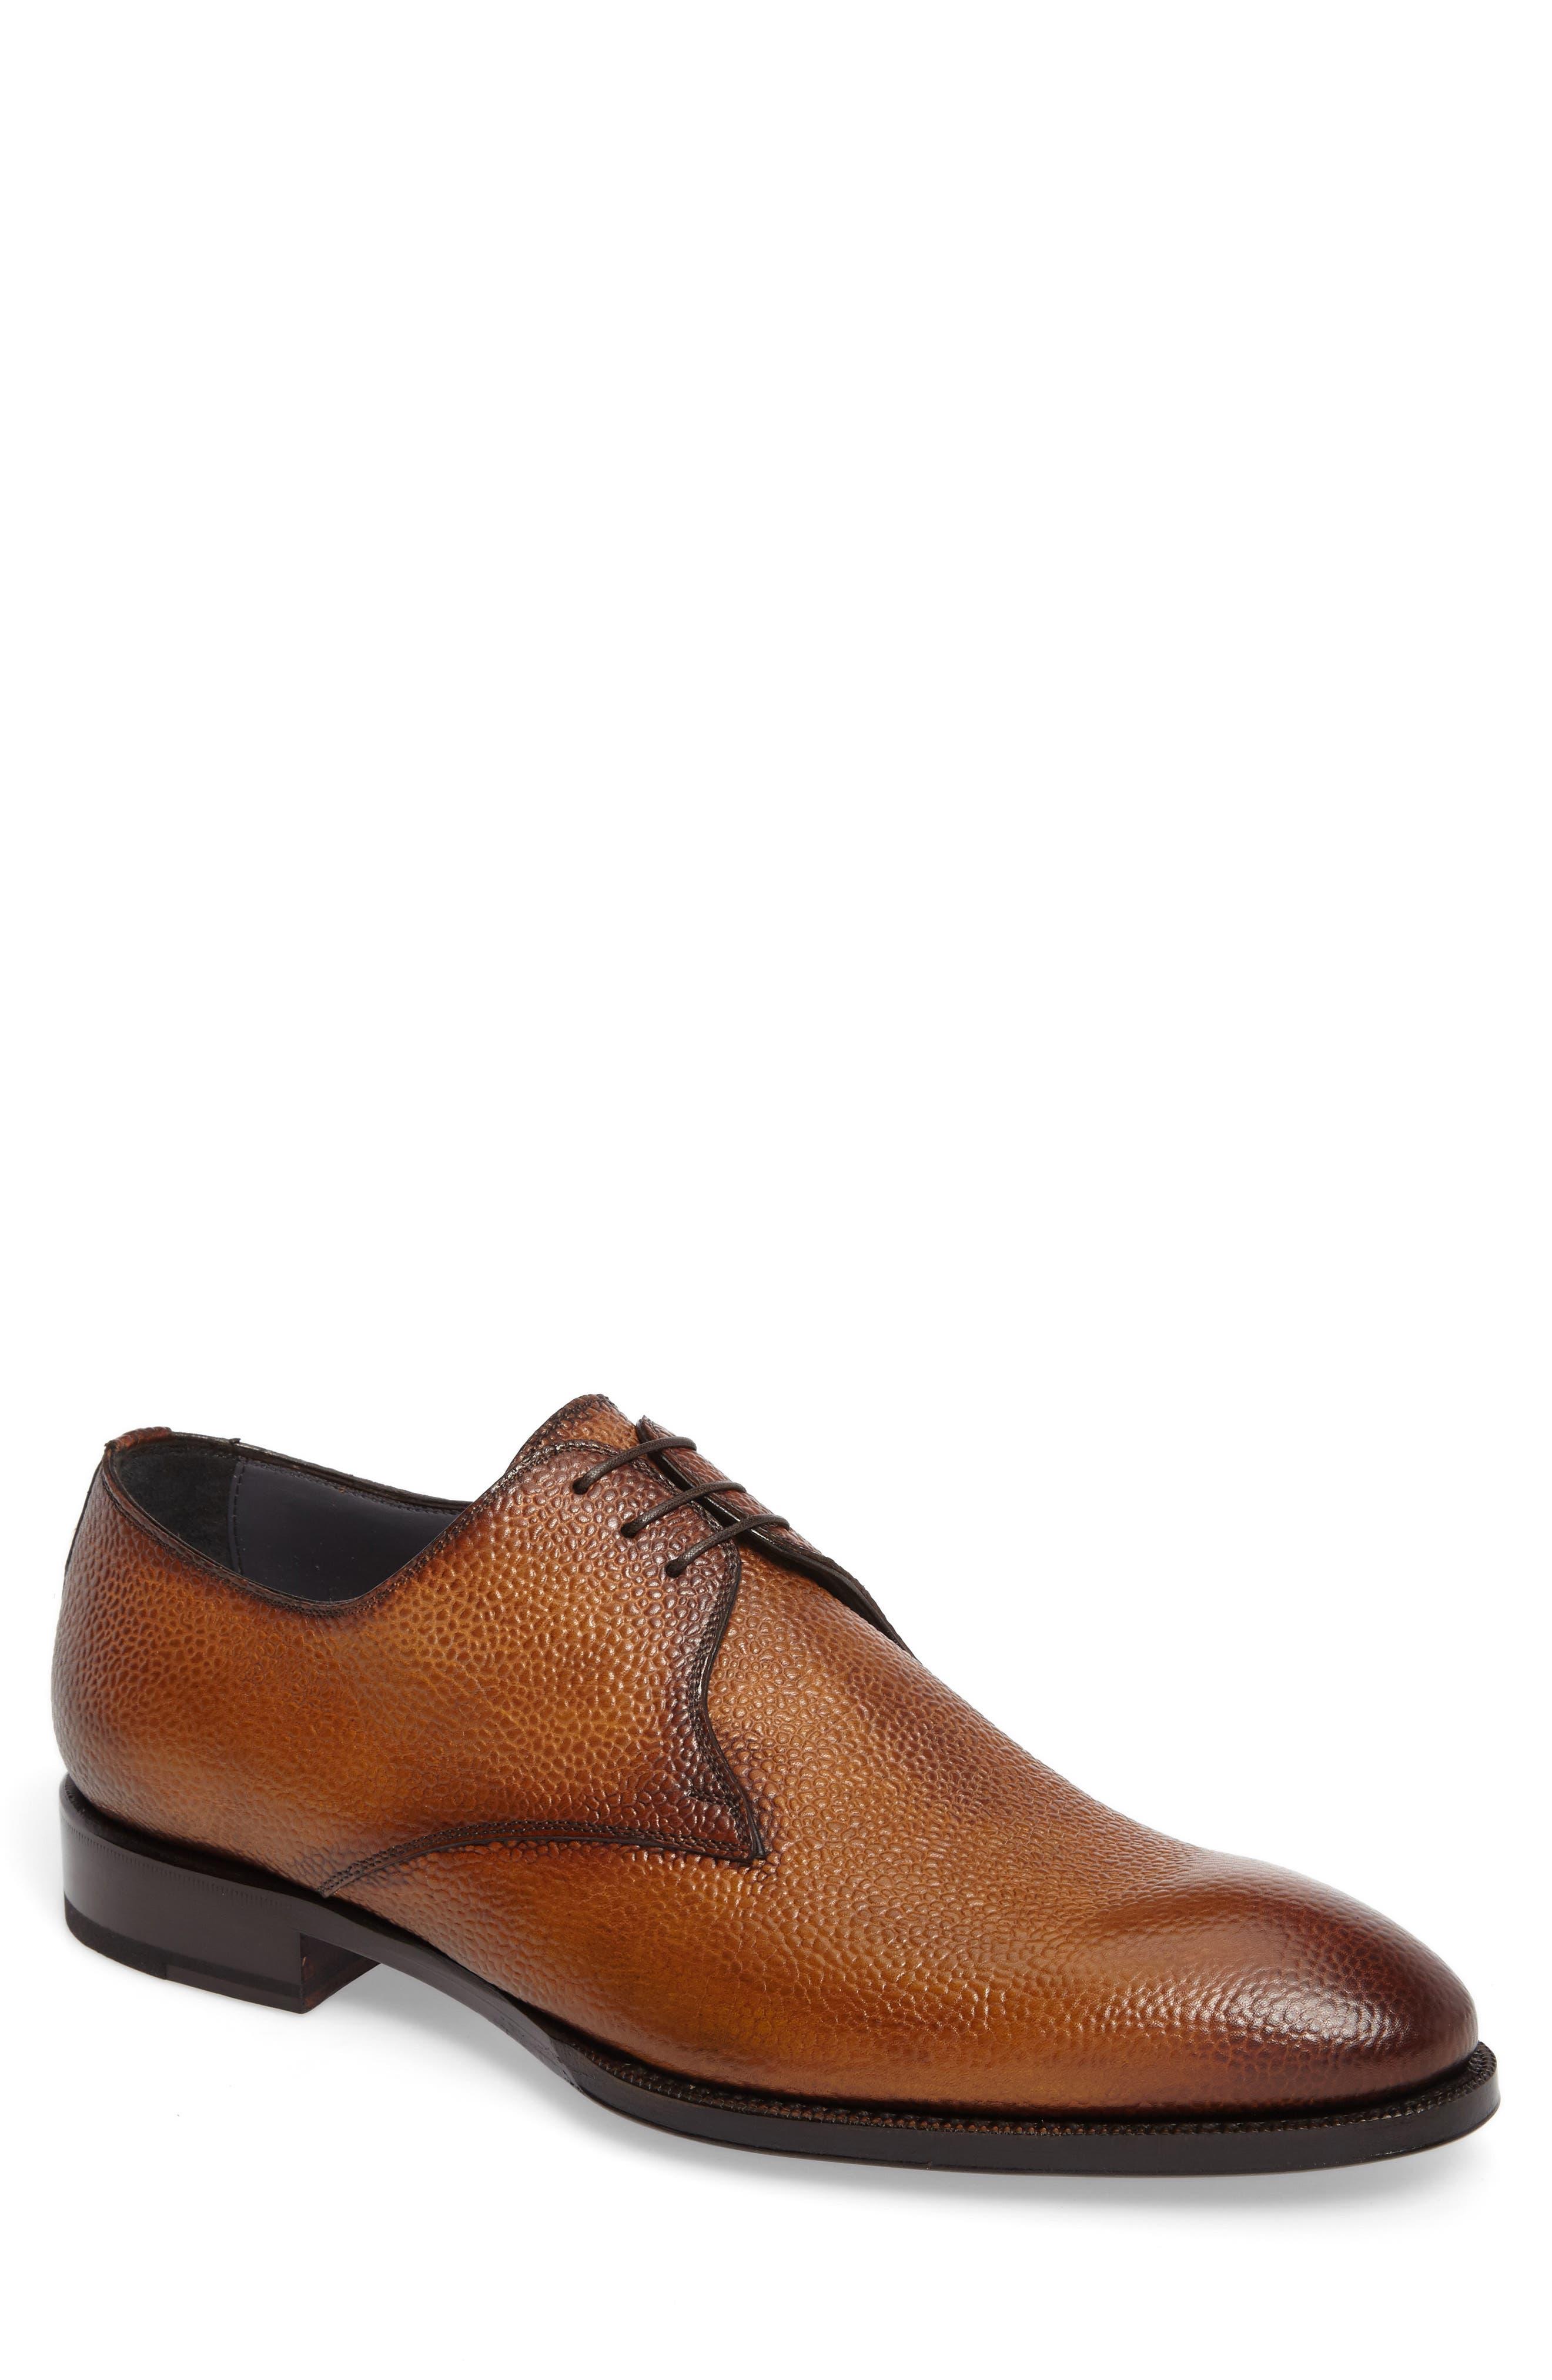 Alternate Image 1 Selected - Di Bianco Gallo Plain Toe Derby (Men)